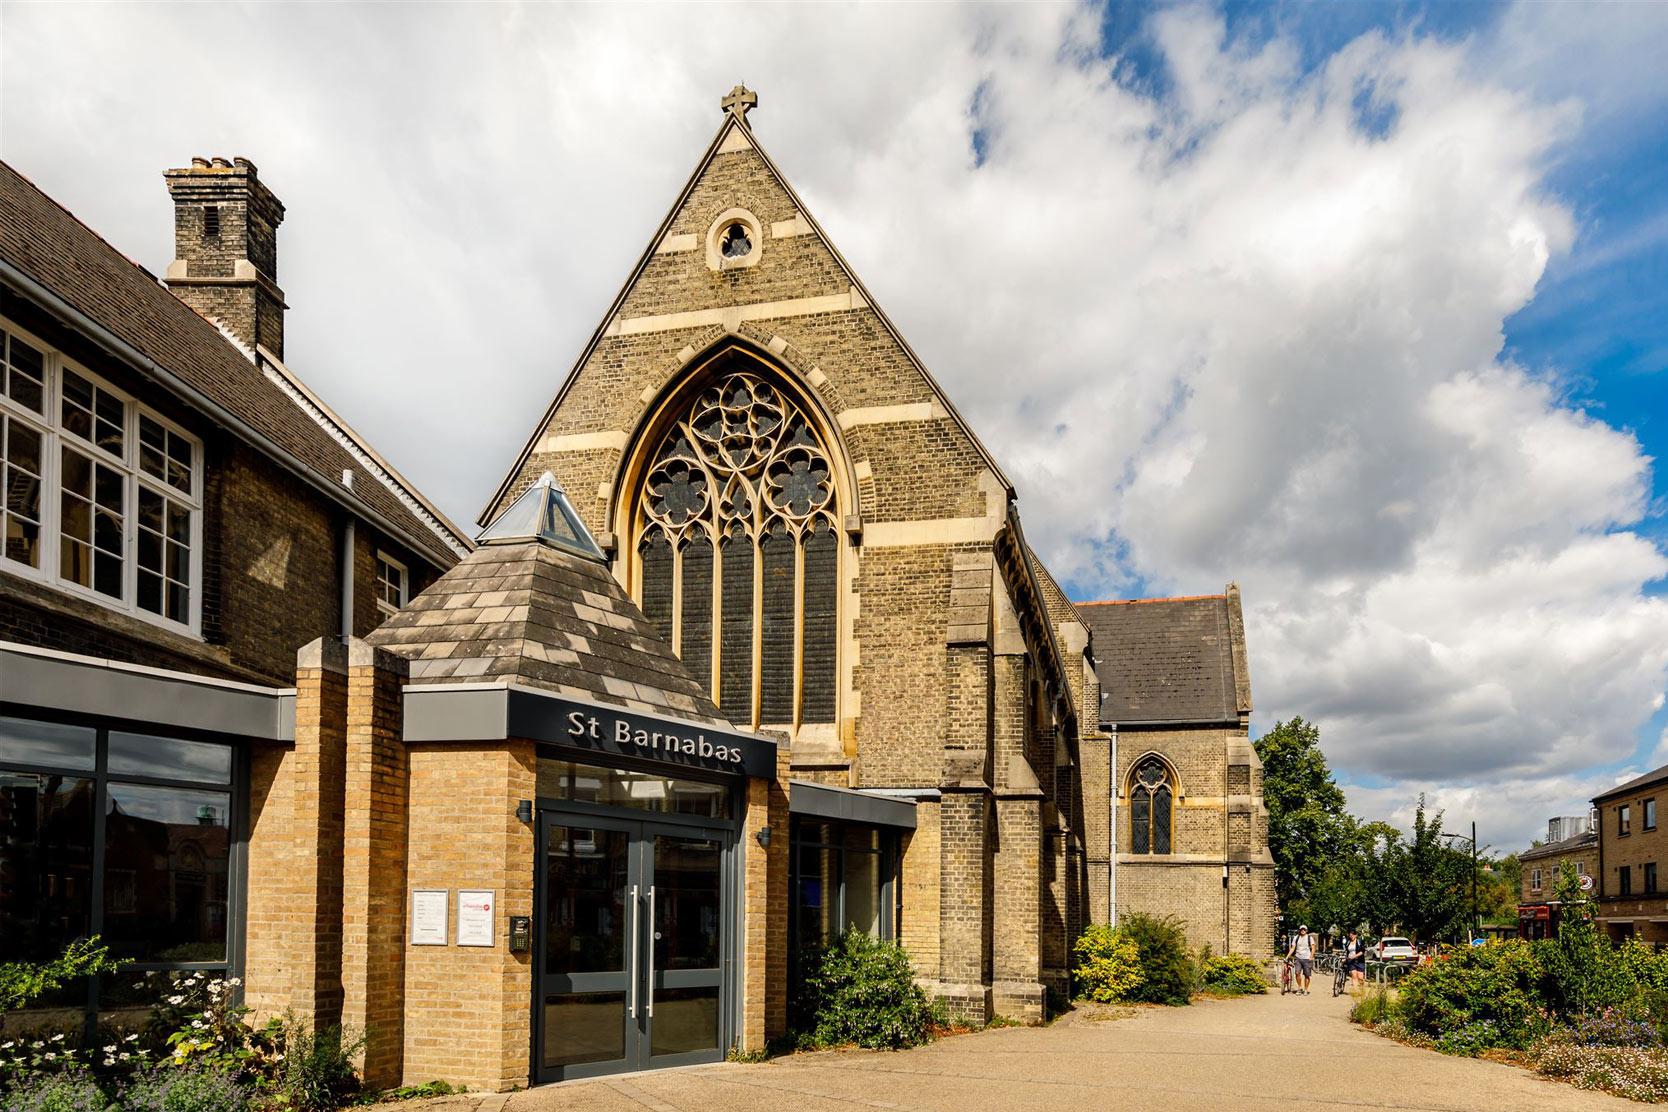 St Barnabas Church Mill Road Cambridge architects